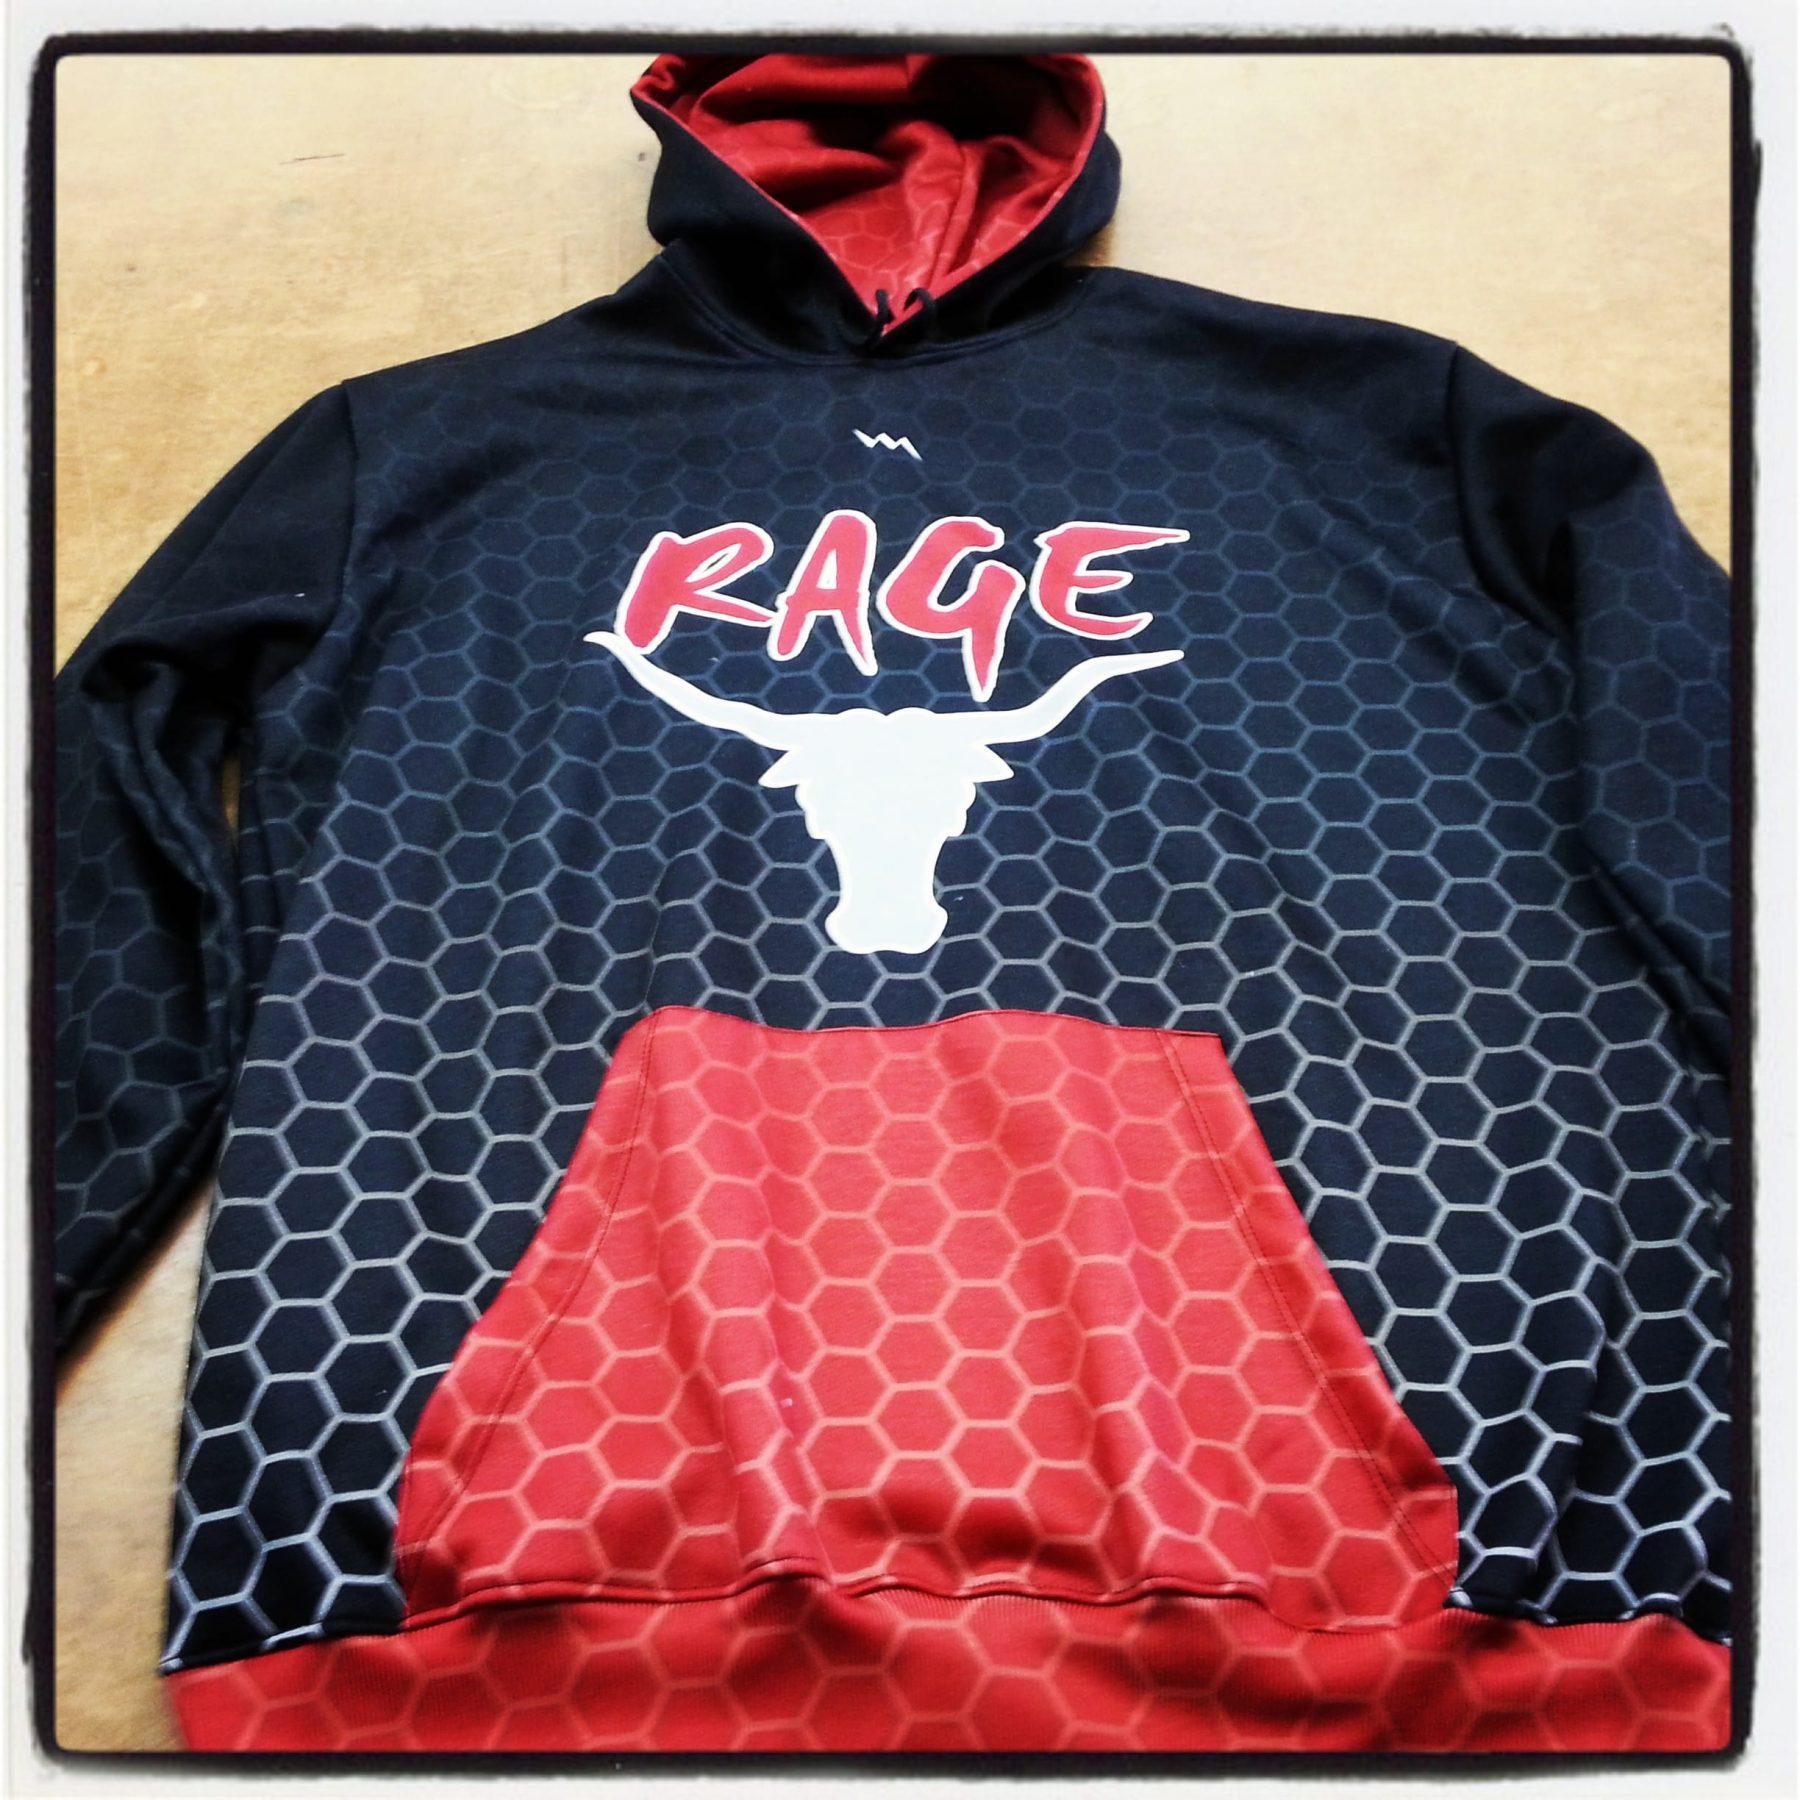 Rage Custom Sweatshirts - Lacrosse Sweats